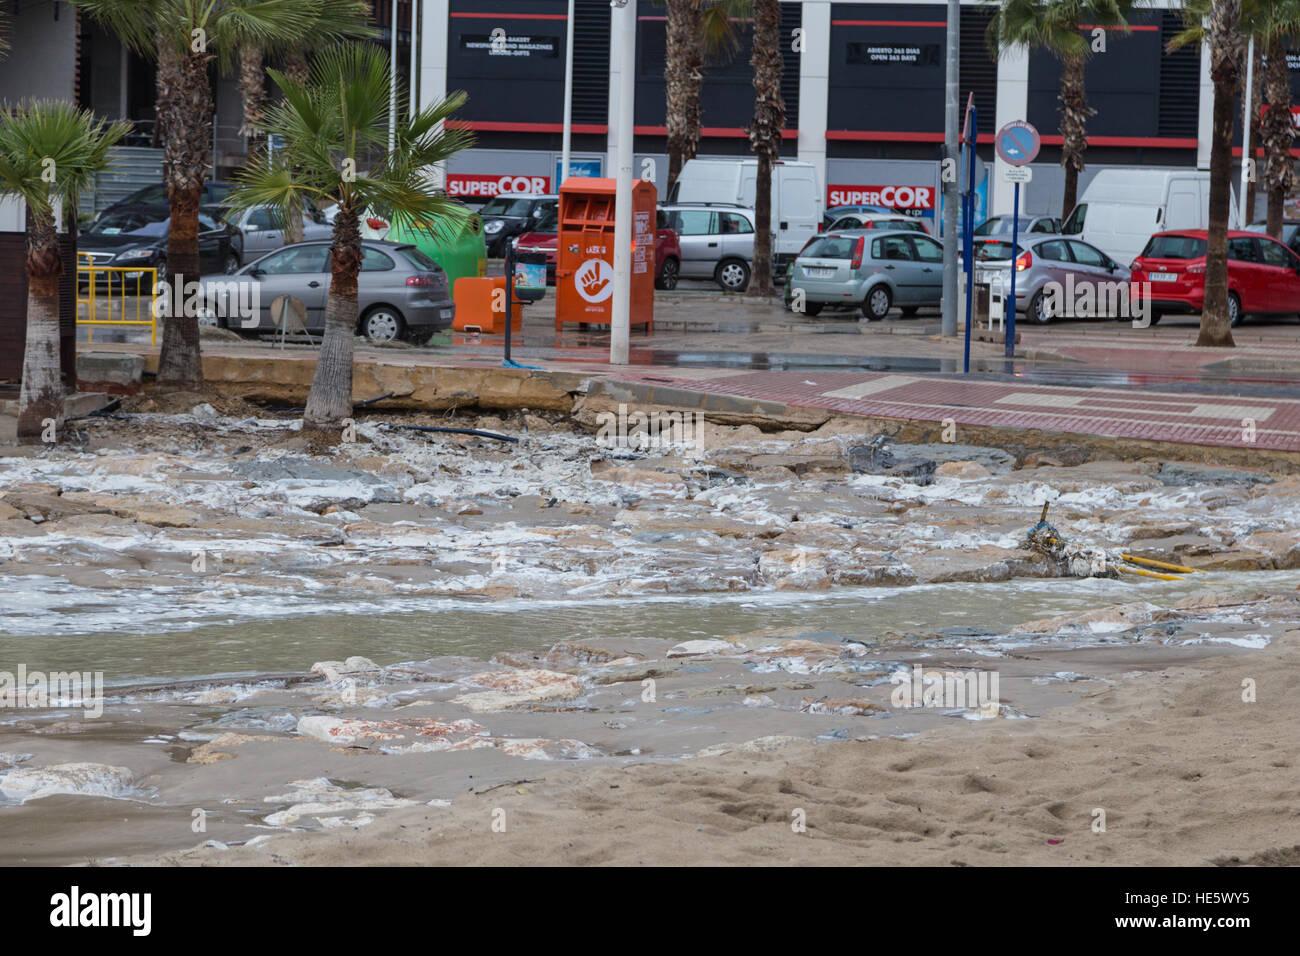 La Cala de Finestrat, Benidorm, Spain  17th December, 2016  Beach